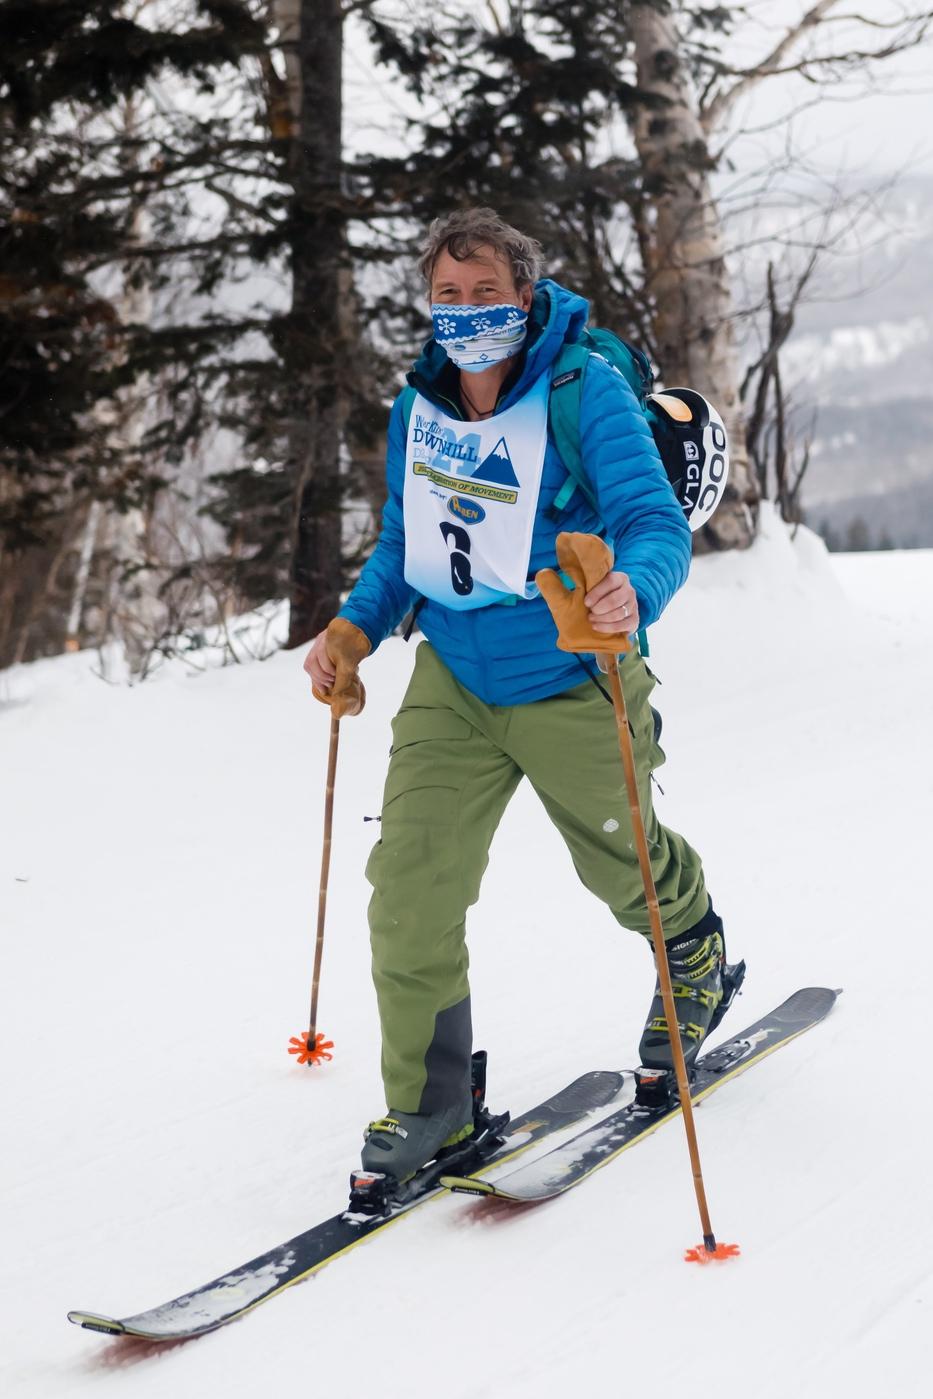 WinterKids Downhill 24 2021 SDP 3760